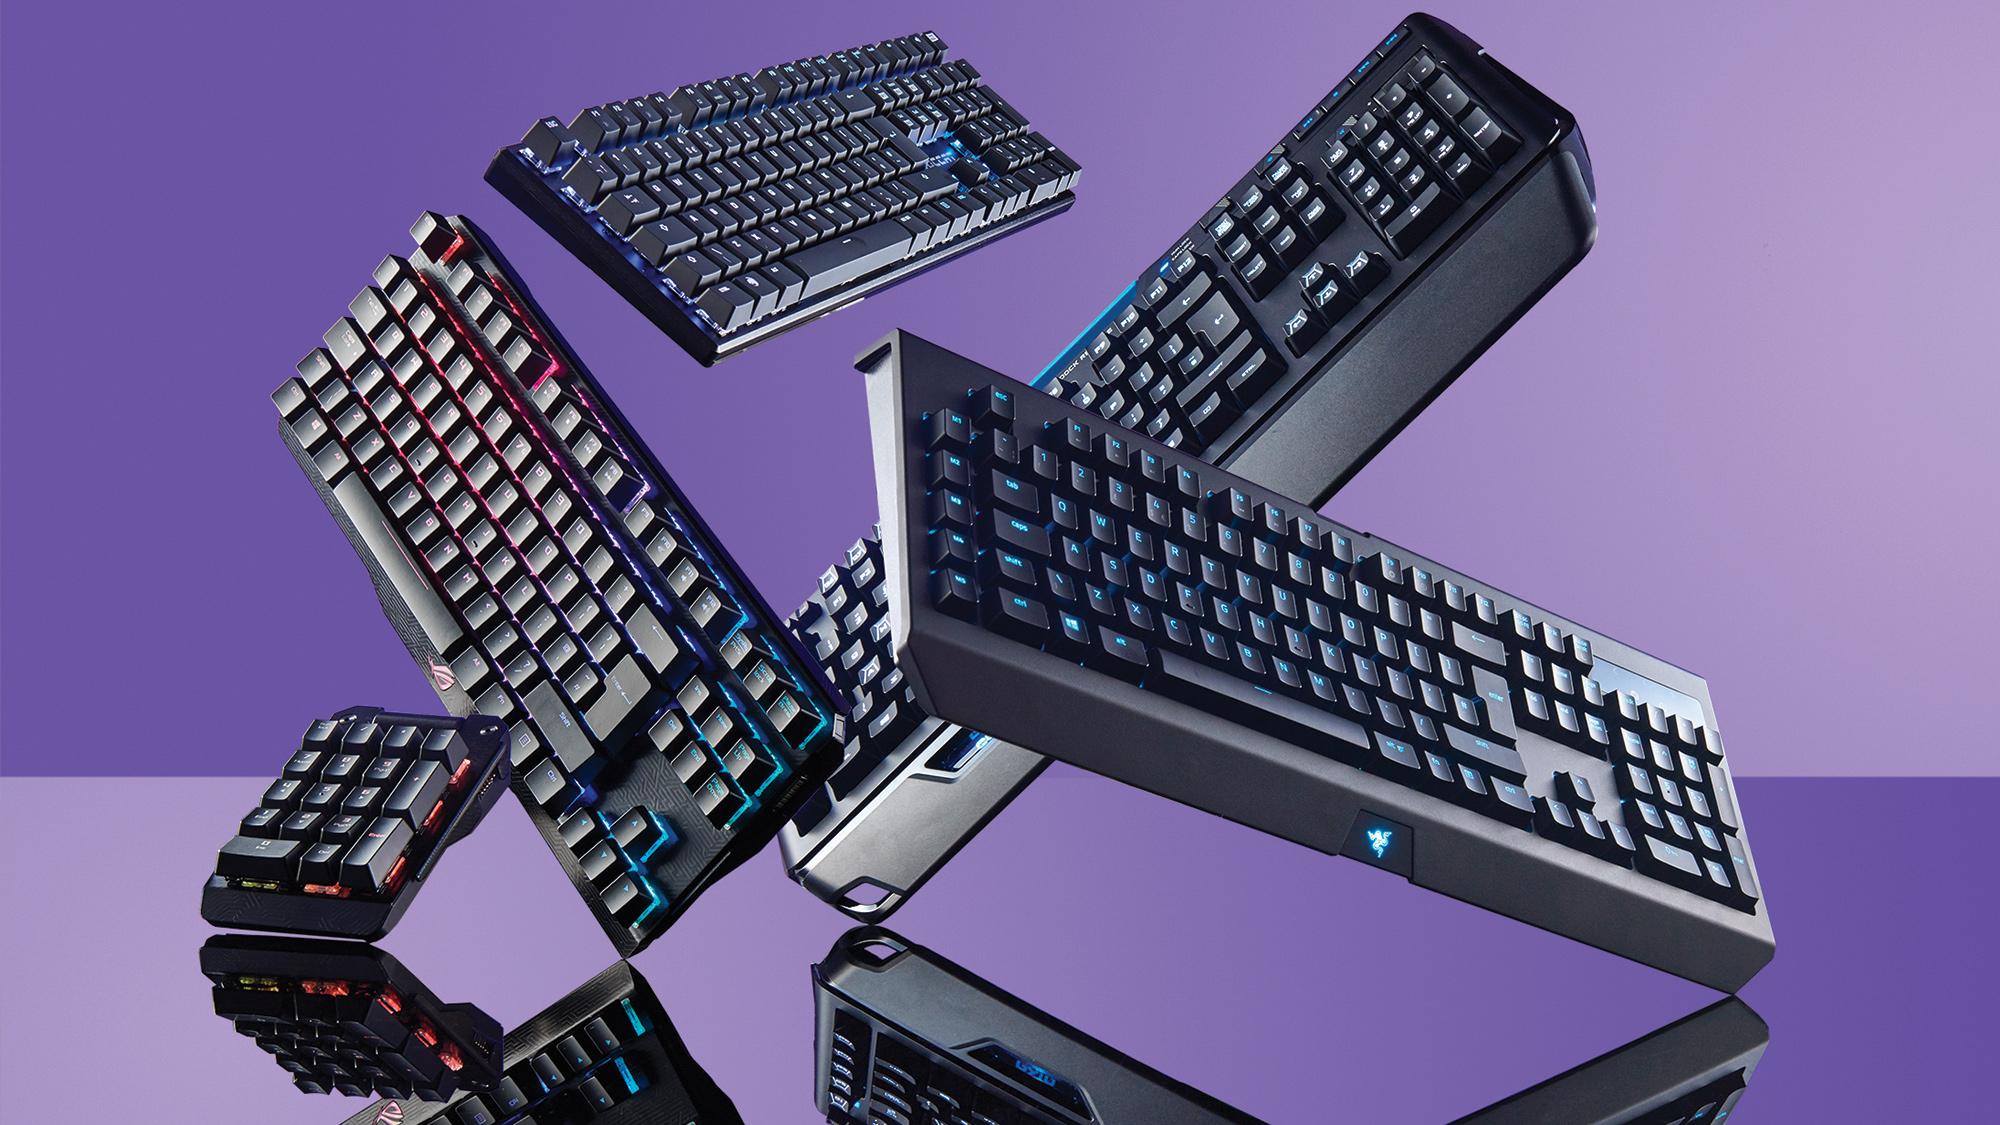 https global techradar com de de news beste gaming tastatur die besten gaming tastaturen die wir getestet haben